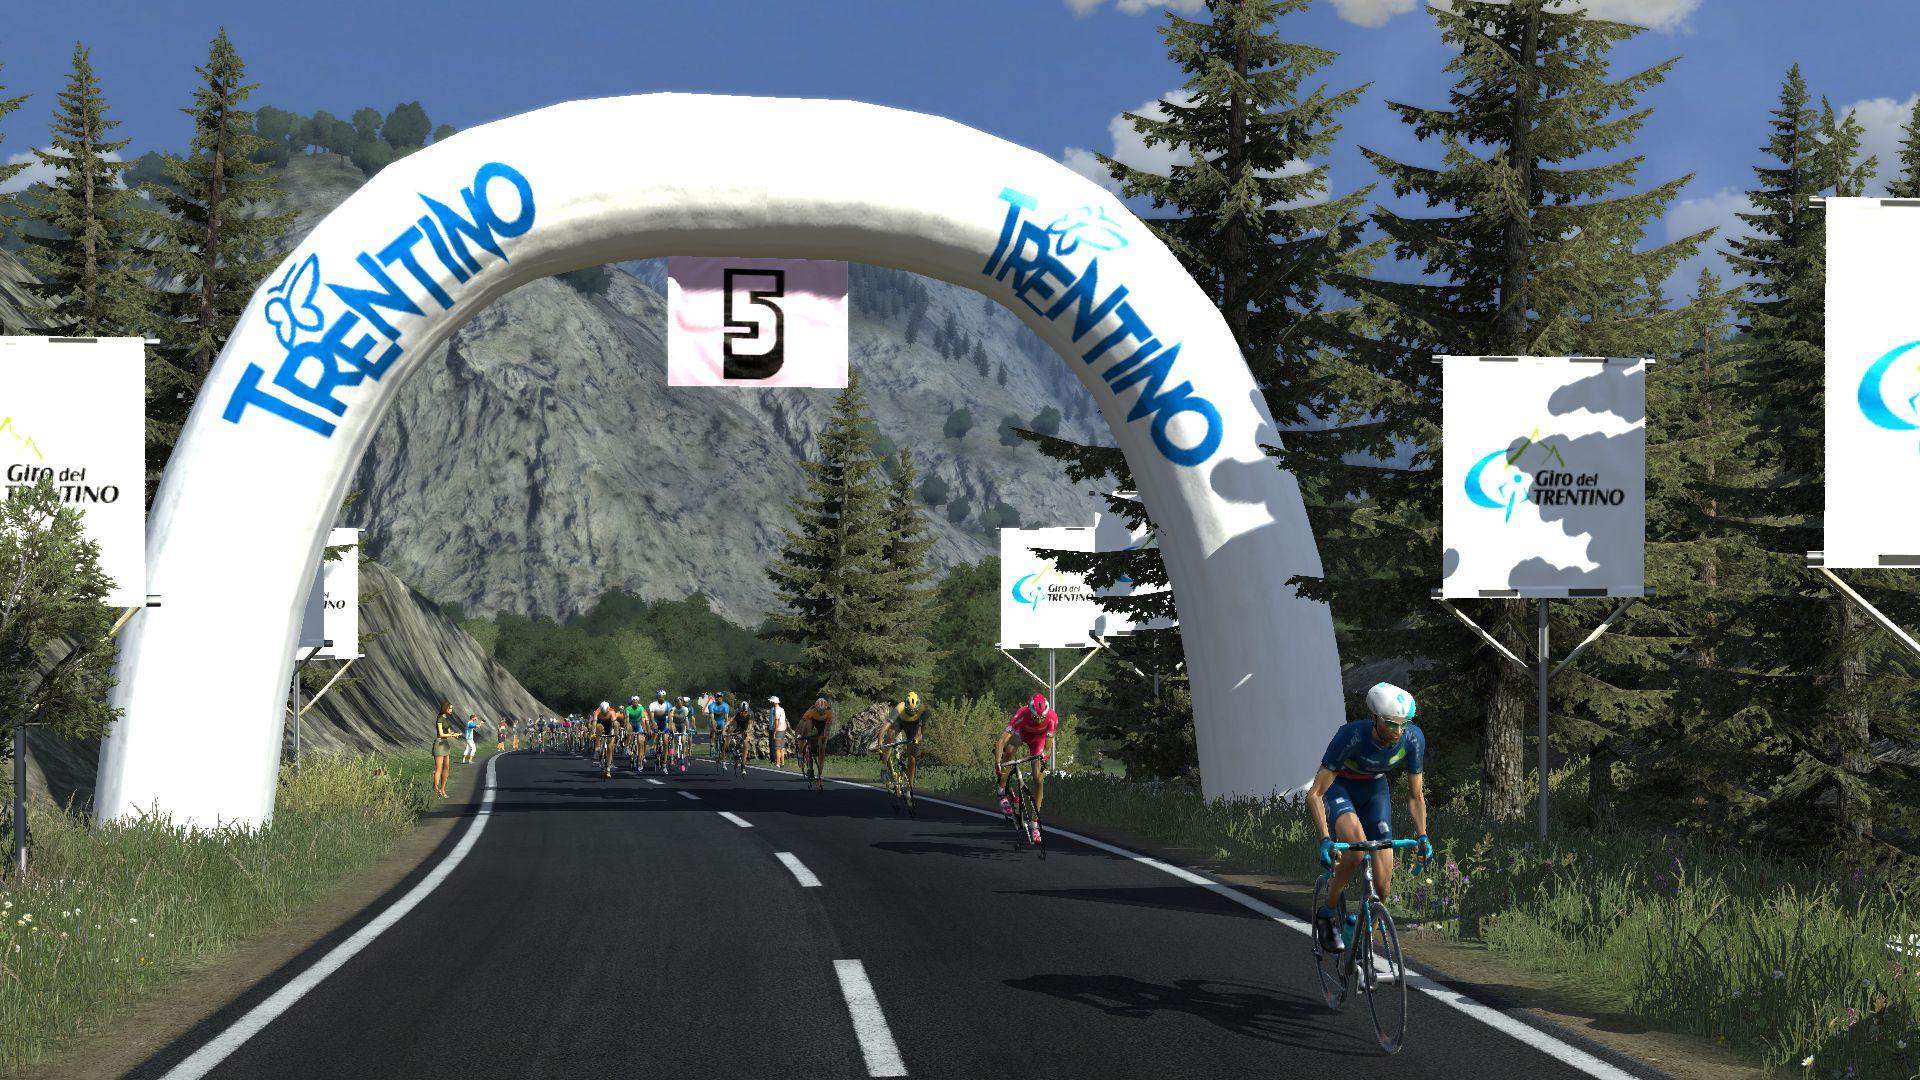 pcmdaily.com/images/mg/2017/Races/CT/Trentino/mg2017_trentino_04_PCM0144.jpg